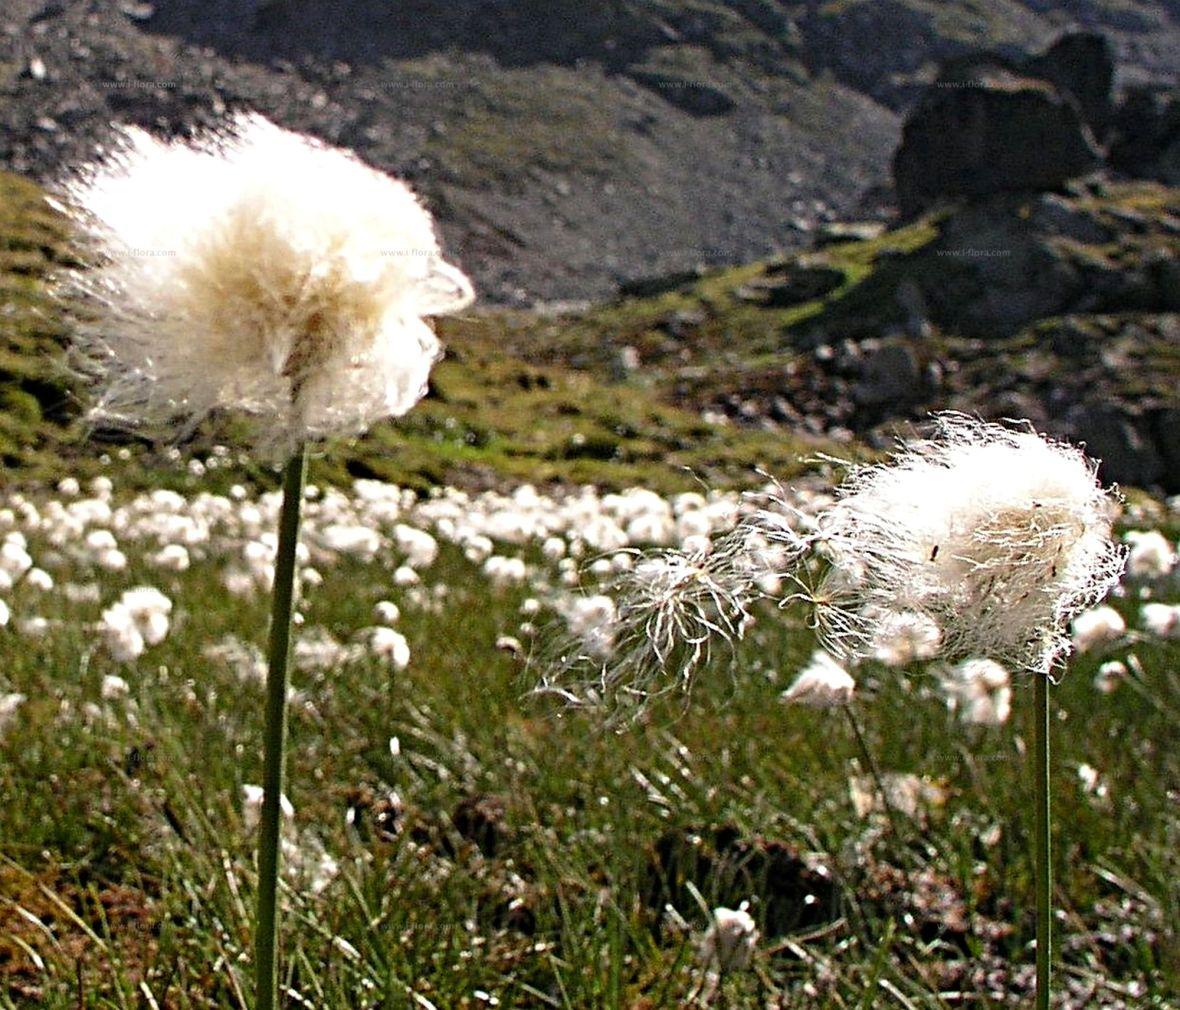 Eriophorum ou linaigrette herbe à jonc ou herbe à coton